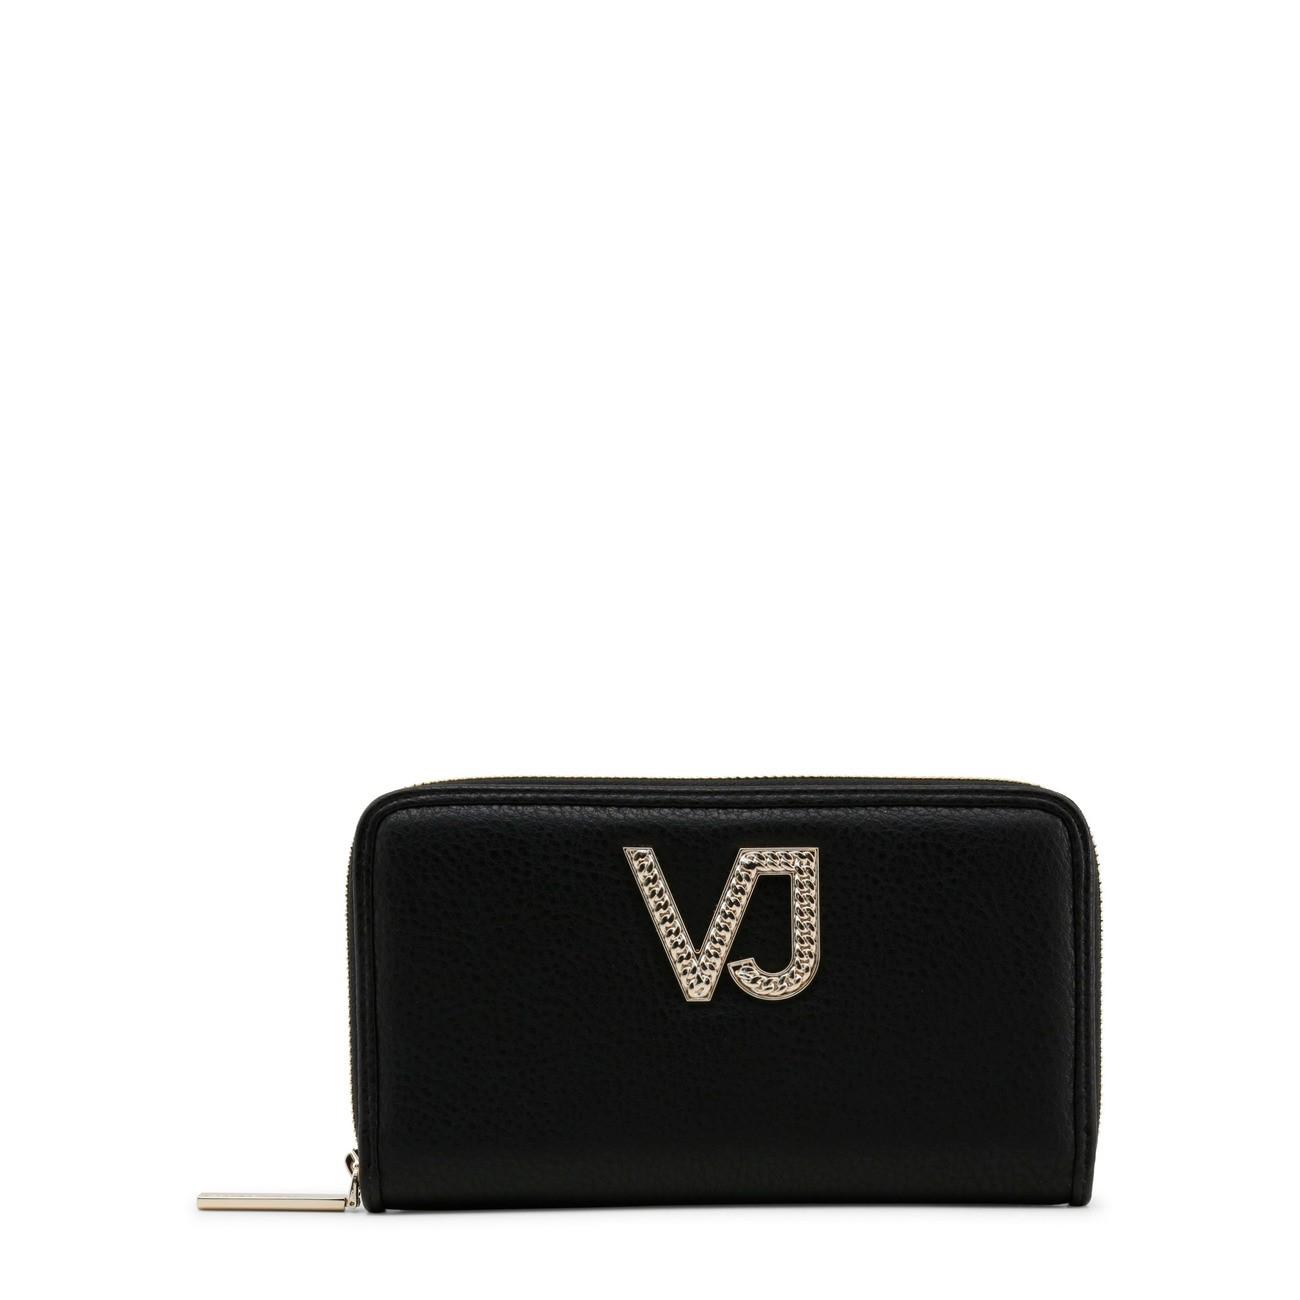 7f735afc631f4 Versace Jeans - oryginalna portmonetka portfel - 7438274964 ...